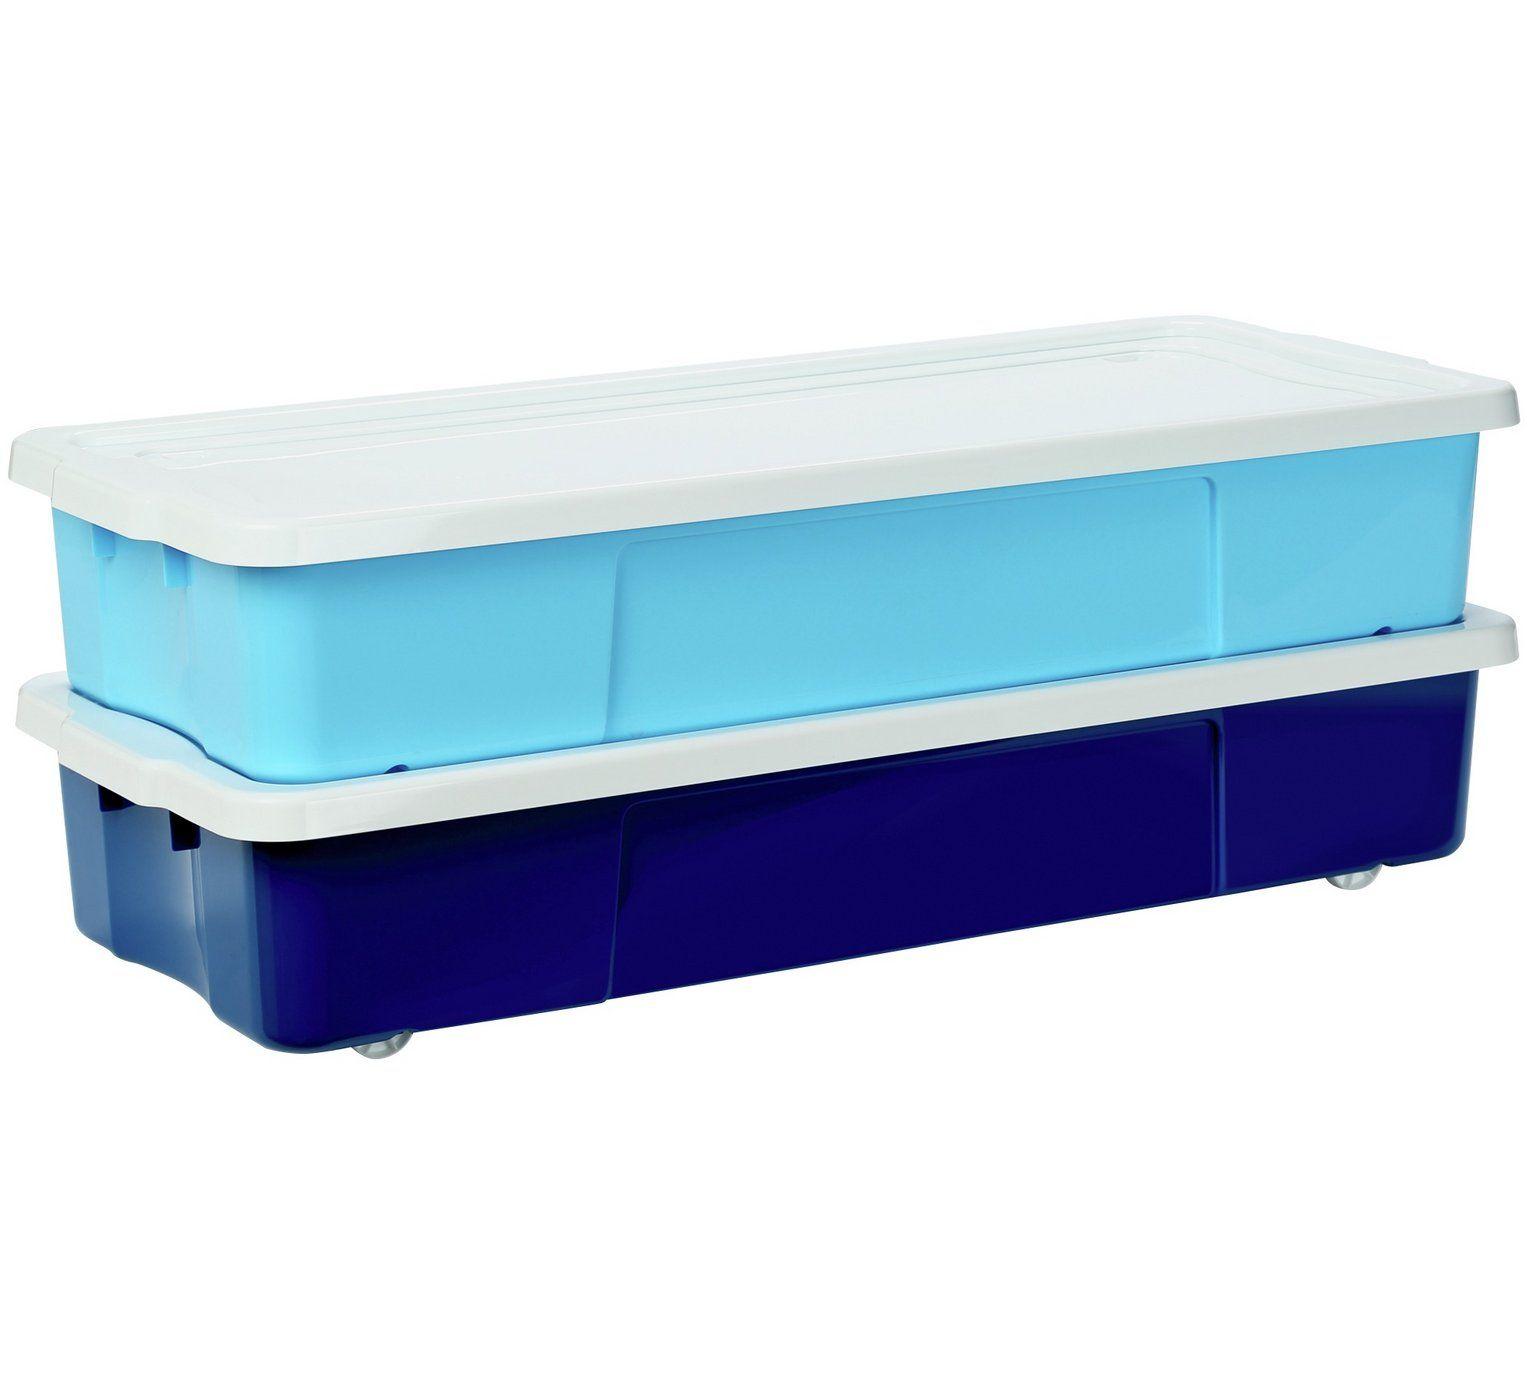 Buy argos home set of 2 45 litre blue underbed storage